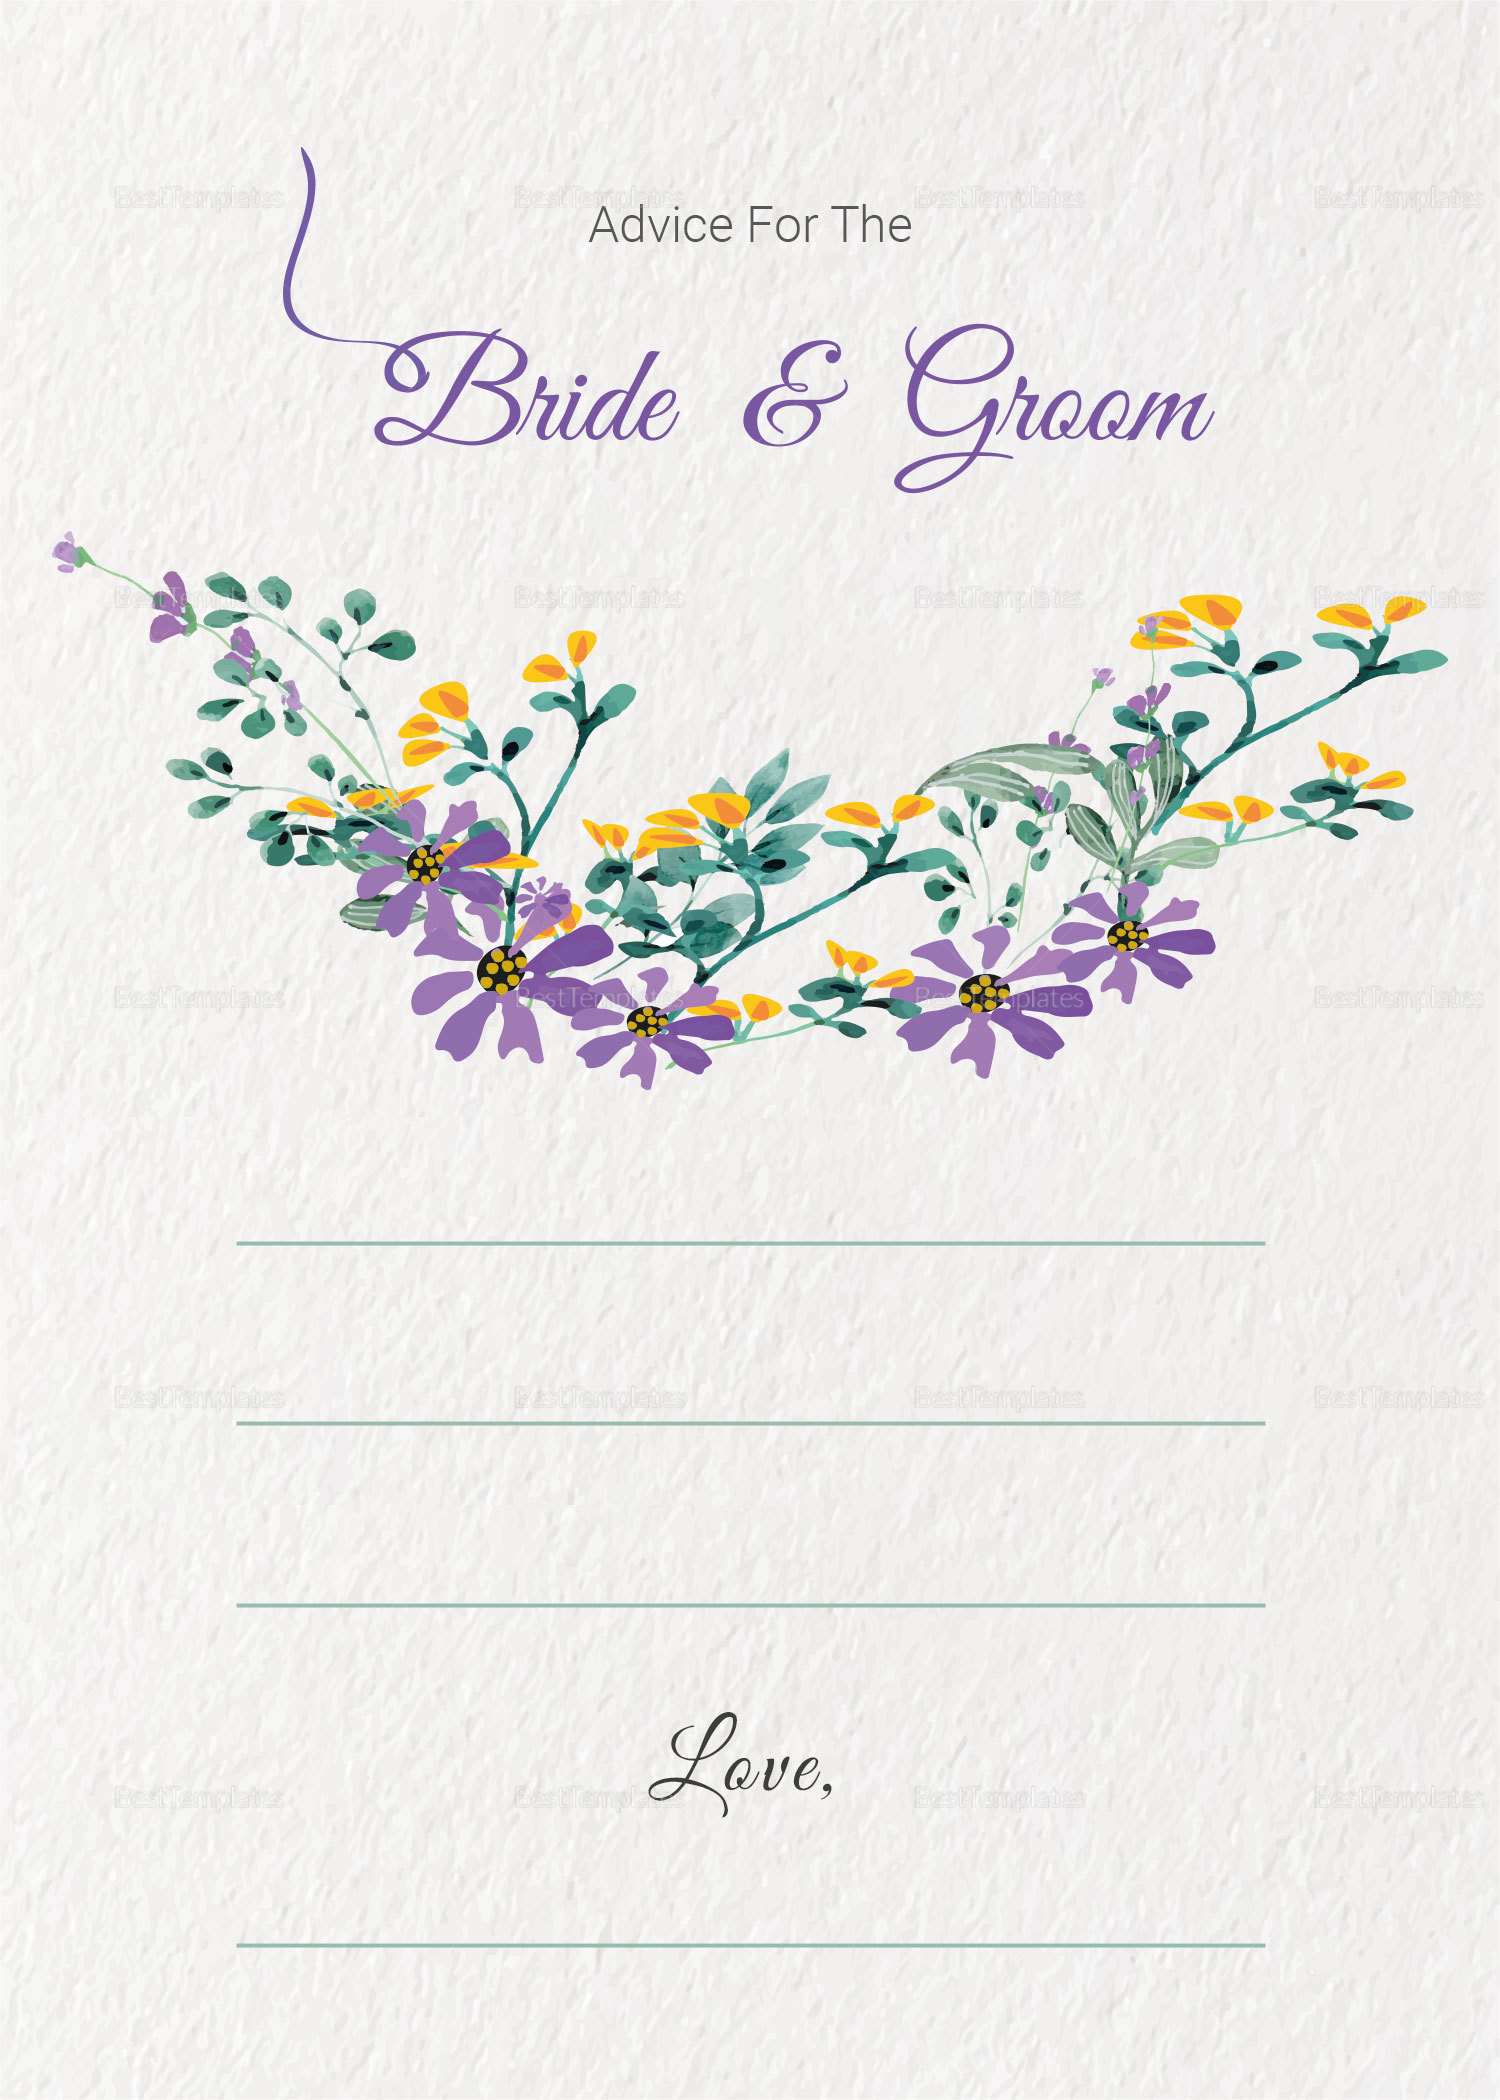 Garden Wedding Advice Card